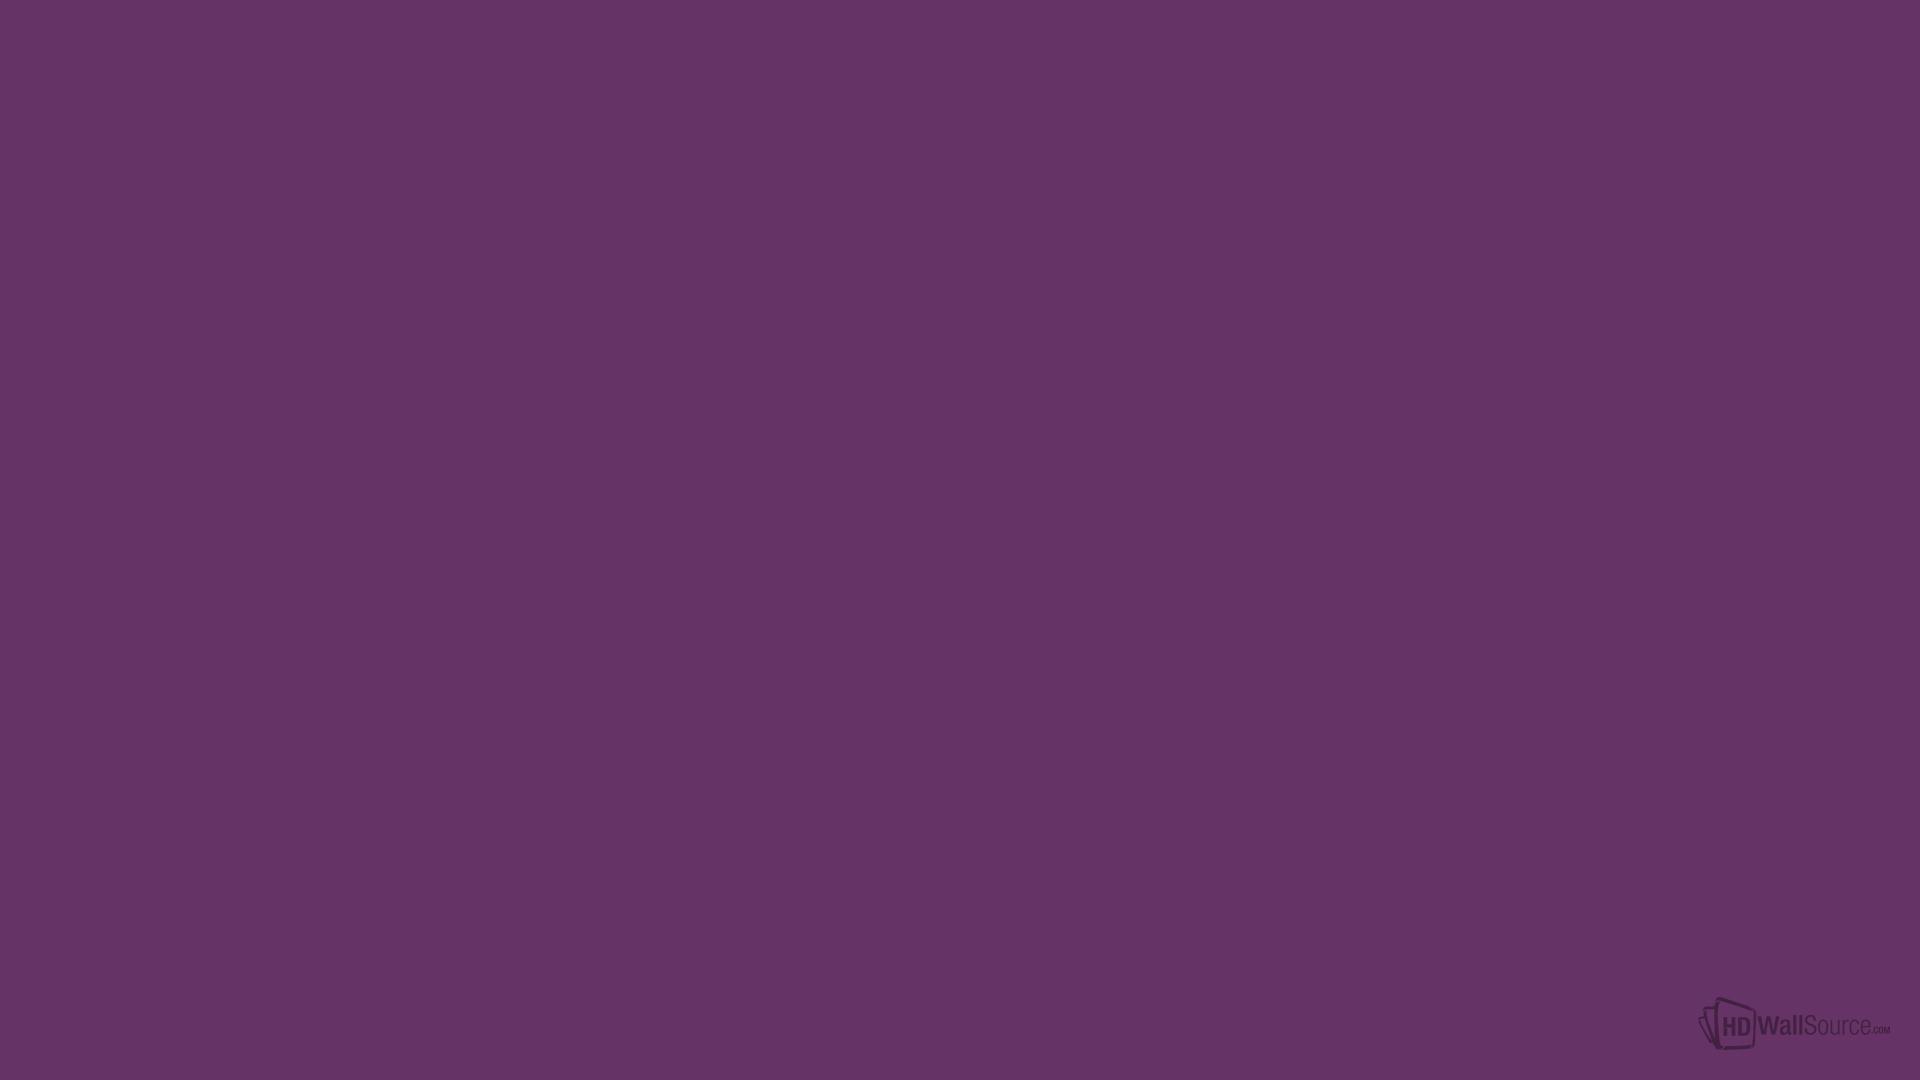 663366 wallpaper 71051